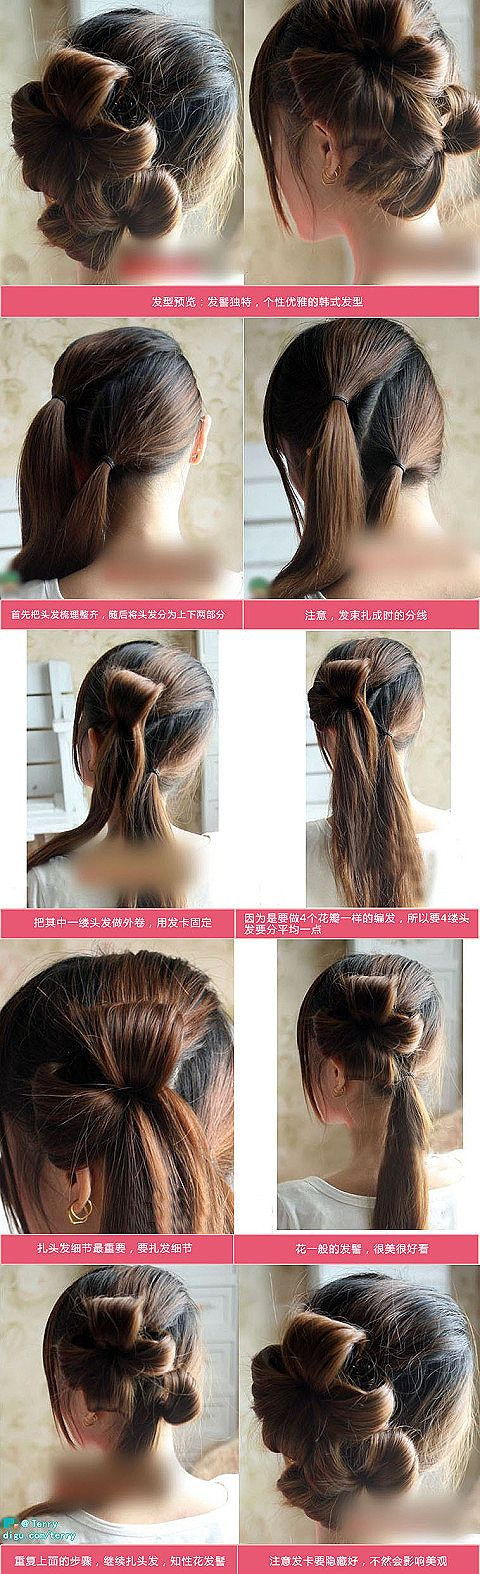 DIY step by step Side hairdo -easy-with braid | DIY hairstyles | Pinterest | Braids, Step by ...